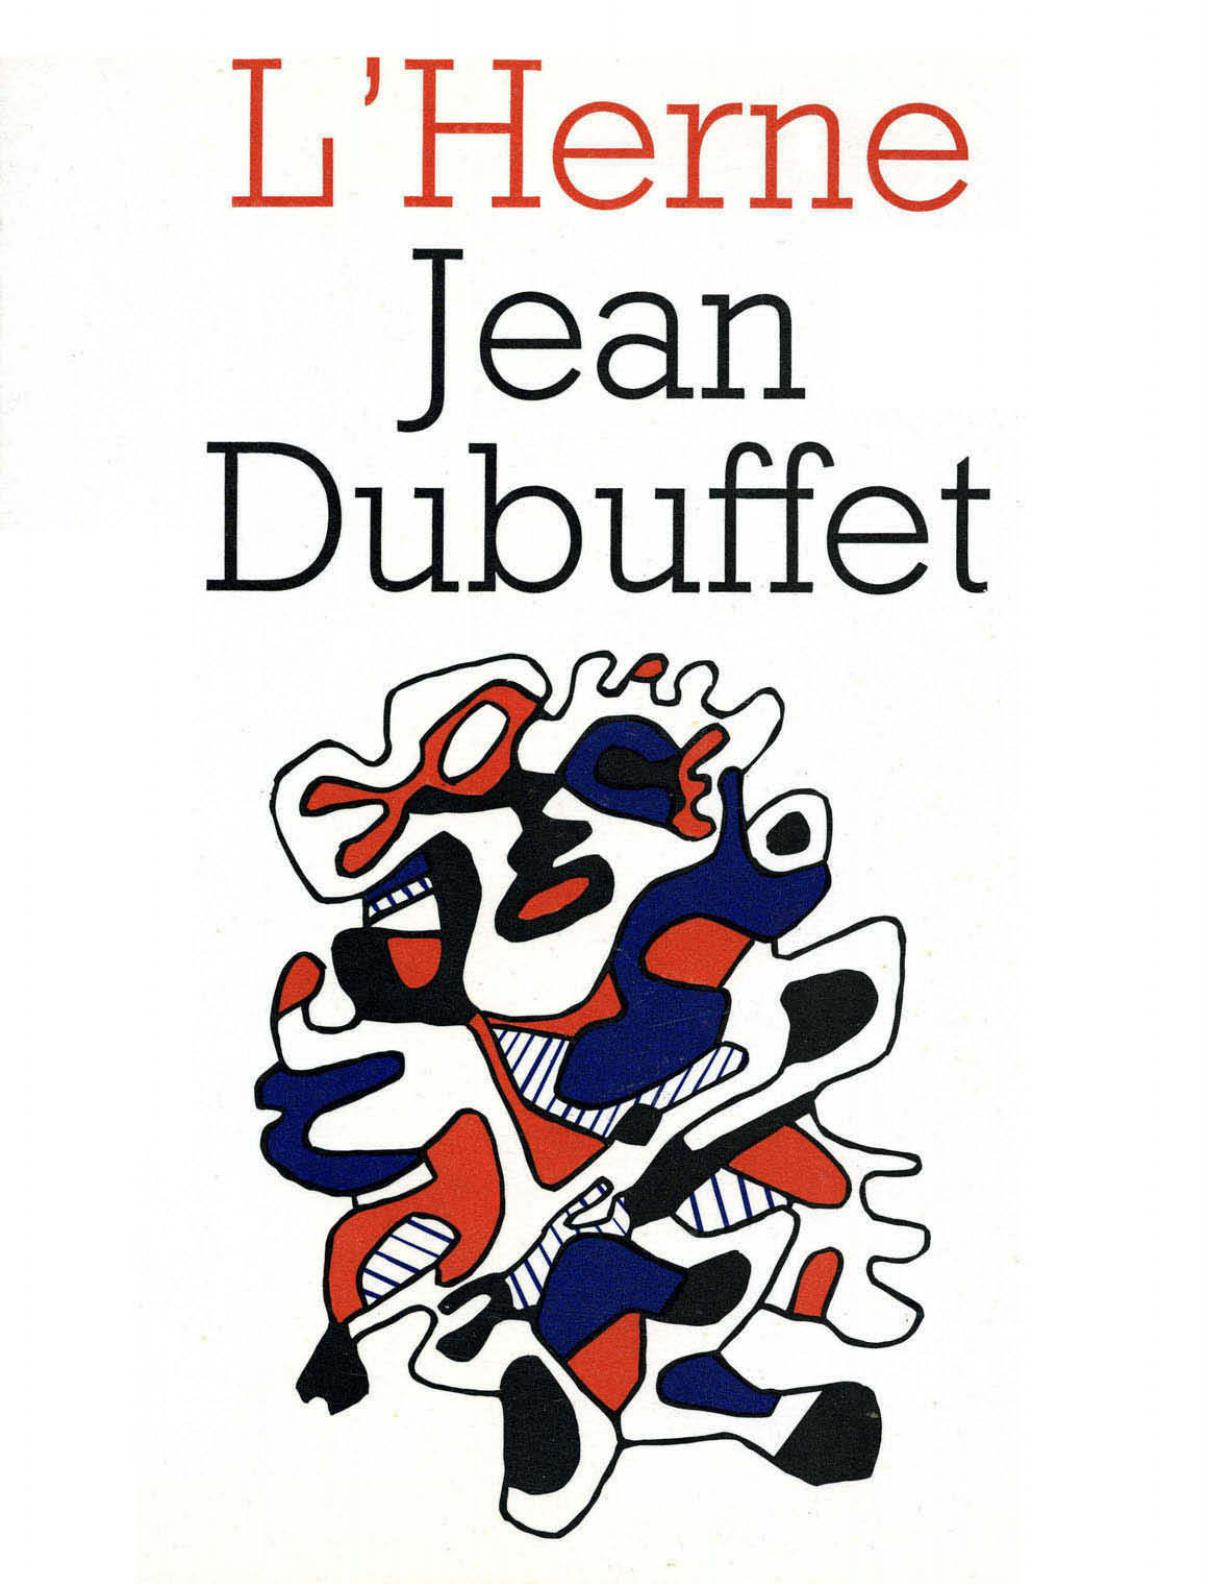 Jean Dubuffet, Cahier de L'Herne